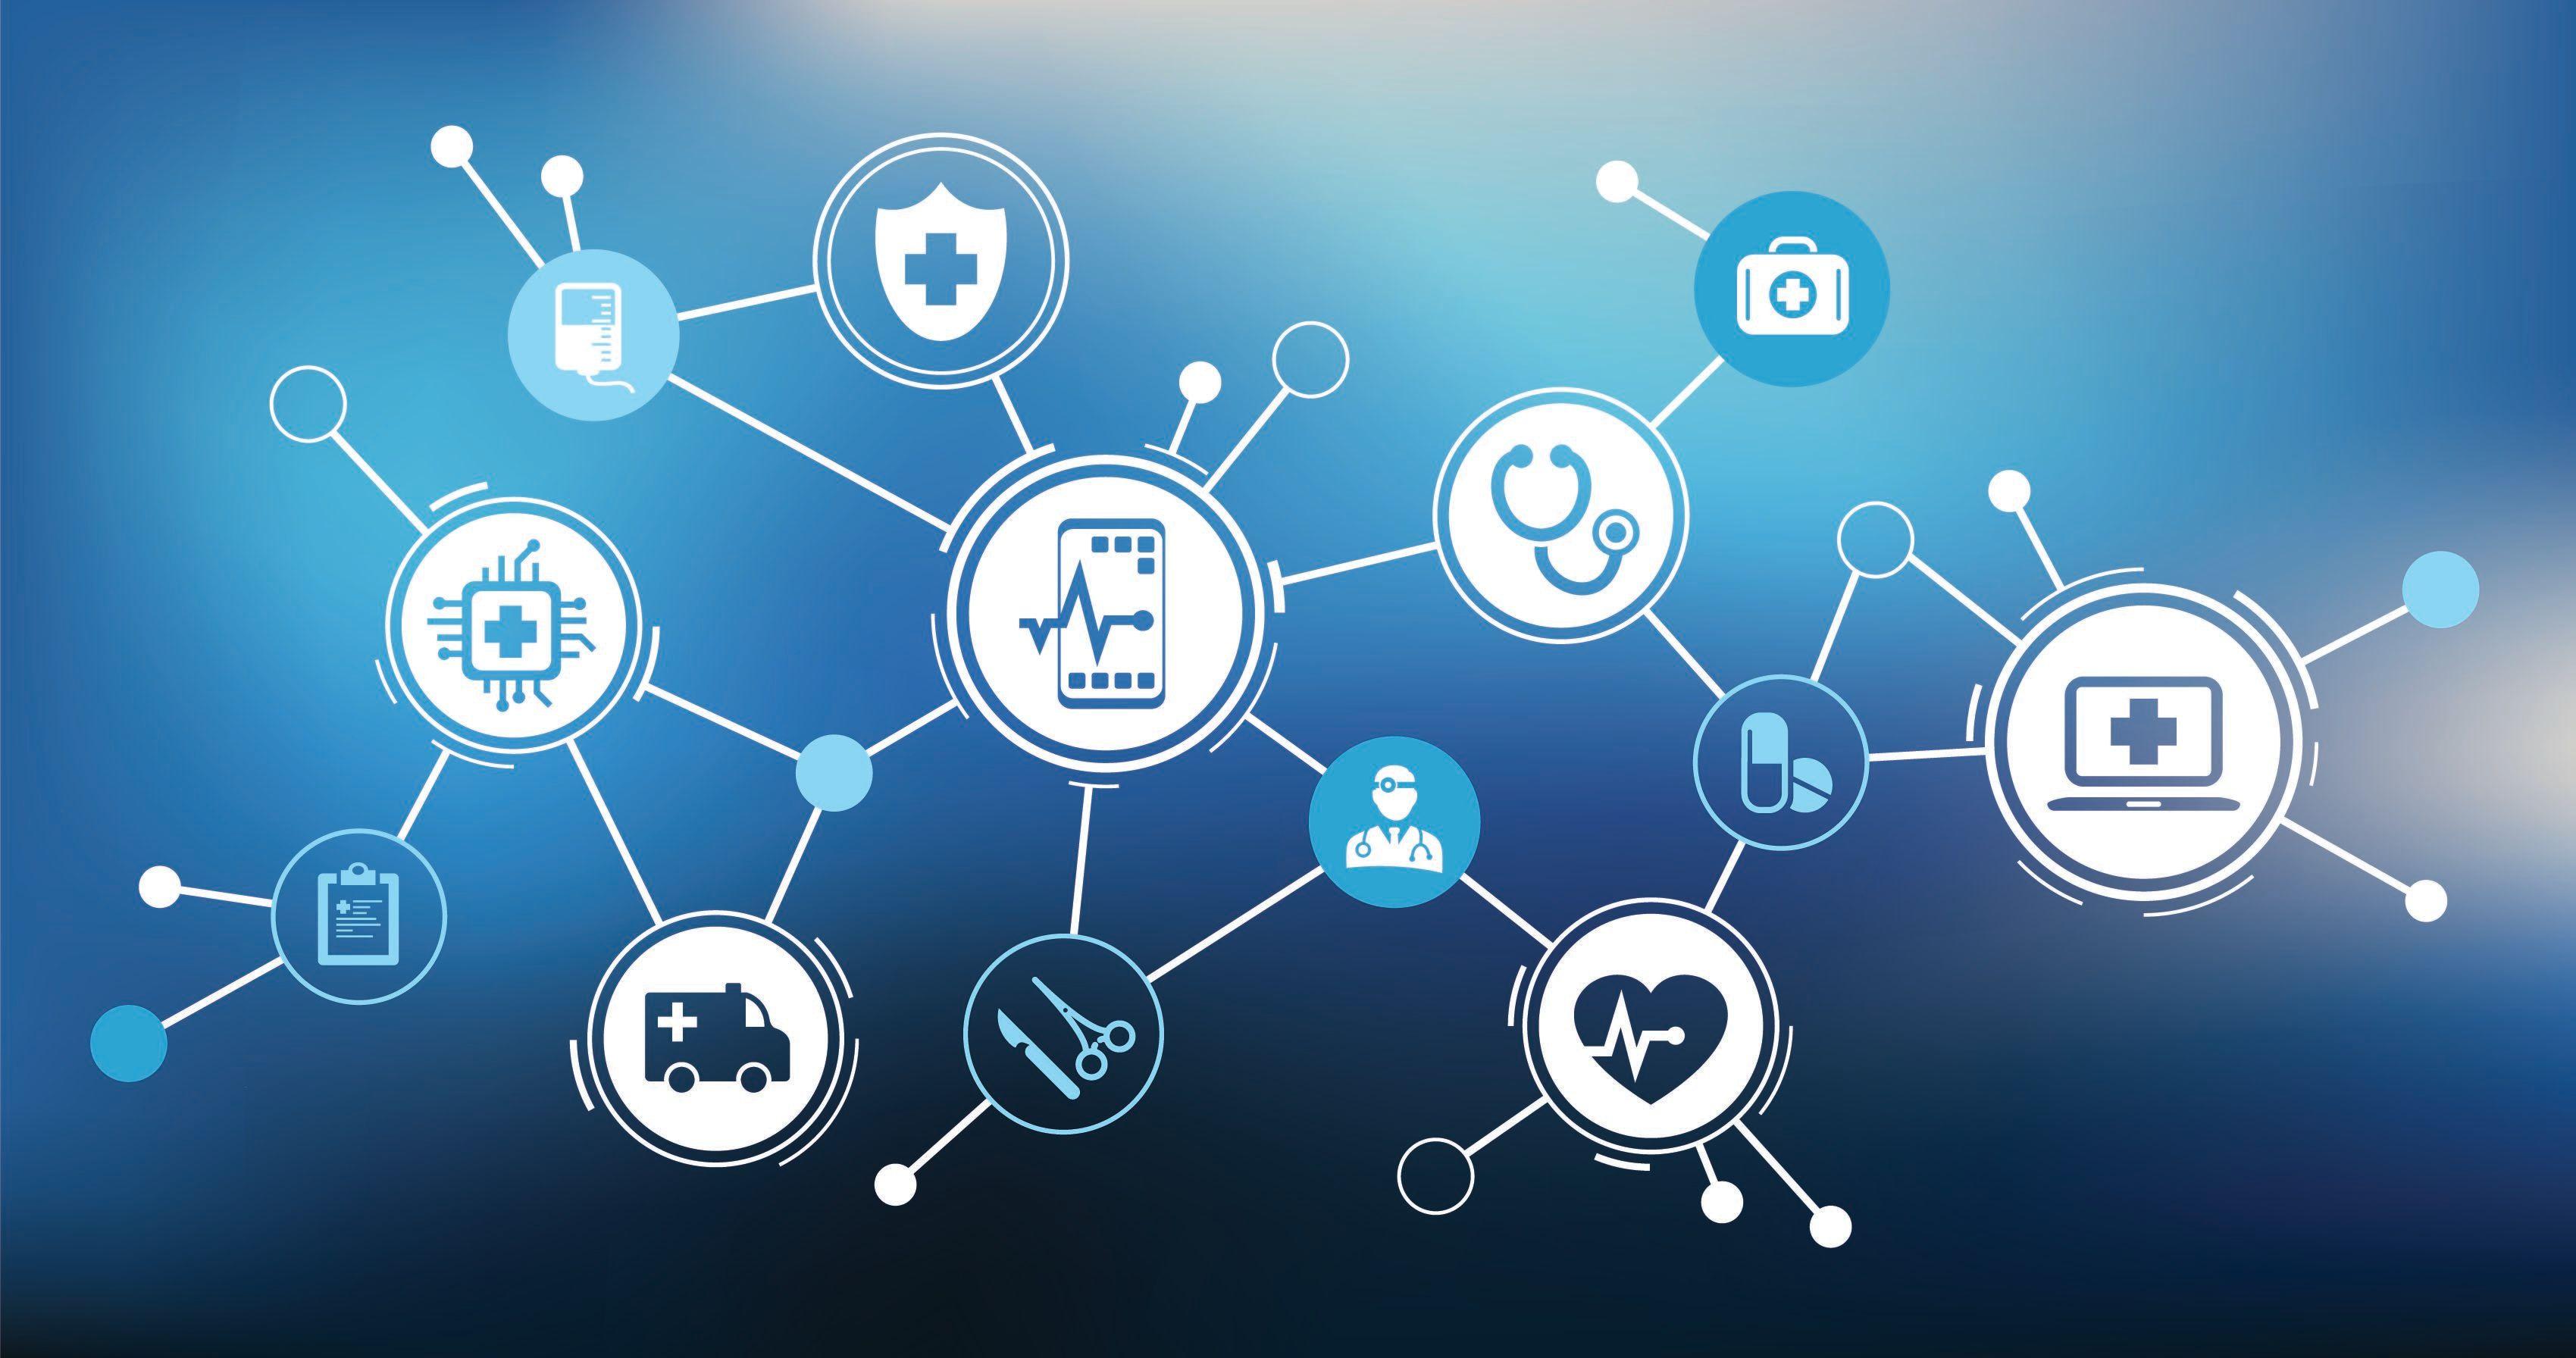 Digital healthcare tools growing in popularity, AMA survey finds   Medical Economics